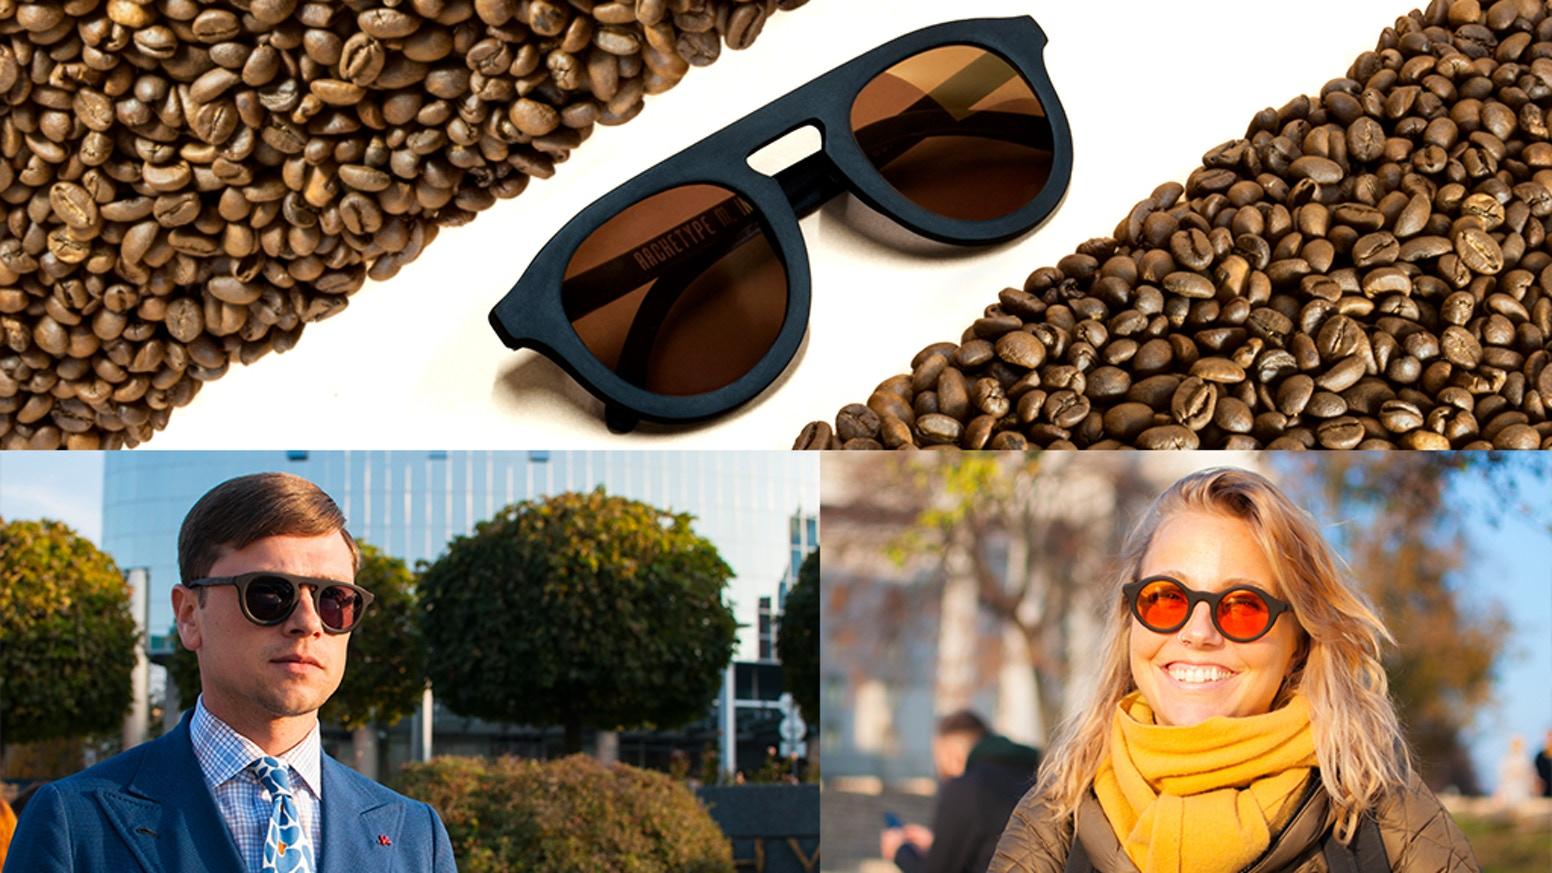 Occhiali al Caffè - Ochis Coffee